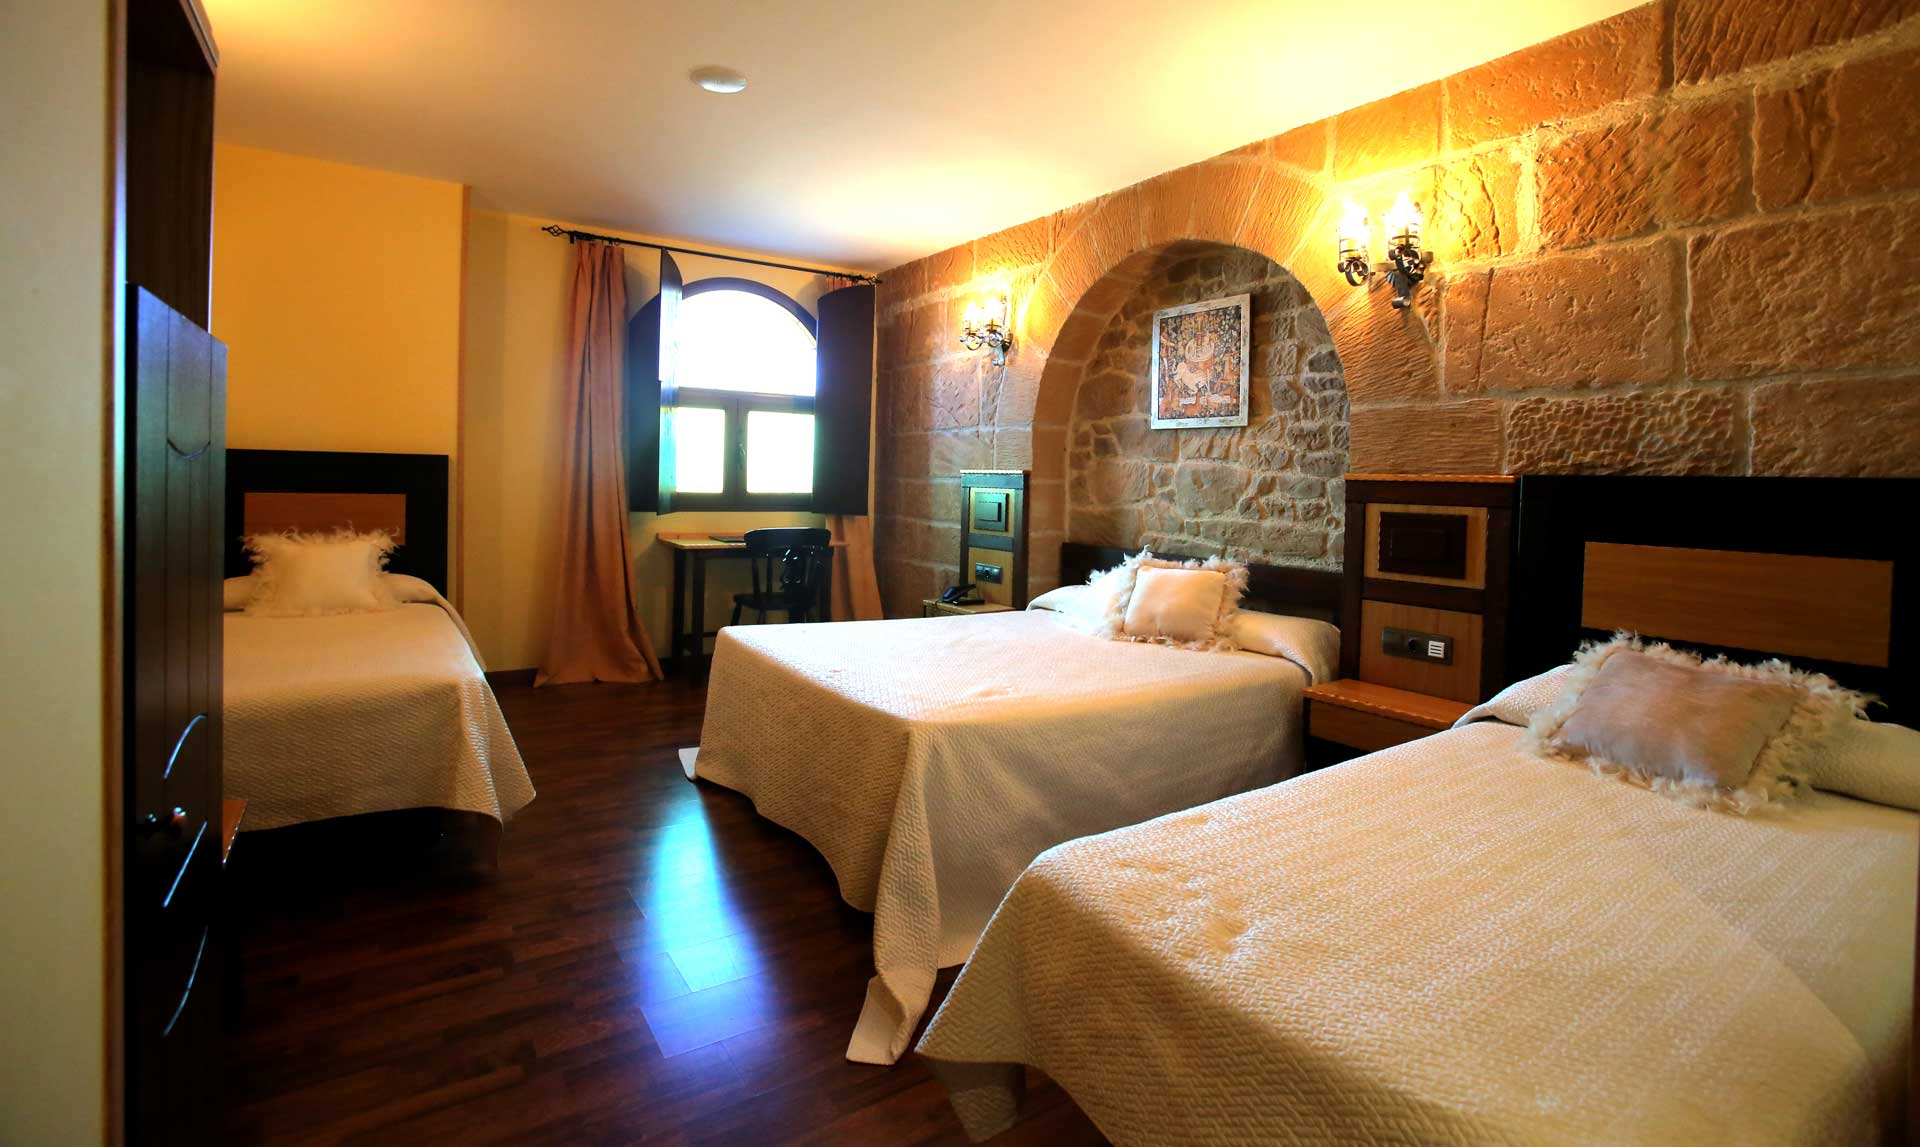 Habitacion-familiar_Hotel-Castillo-Bonavia_Zaragoza